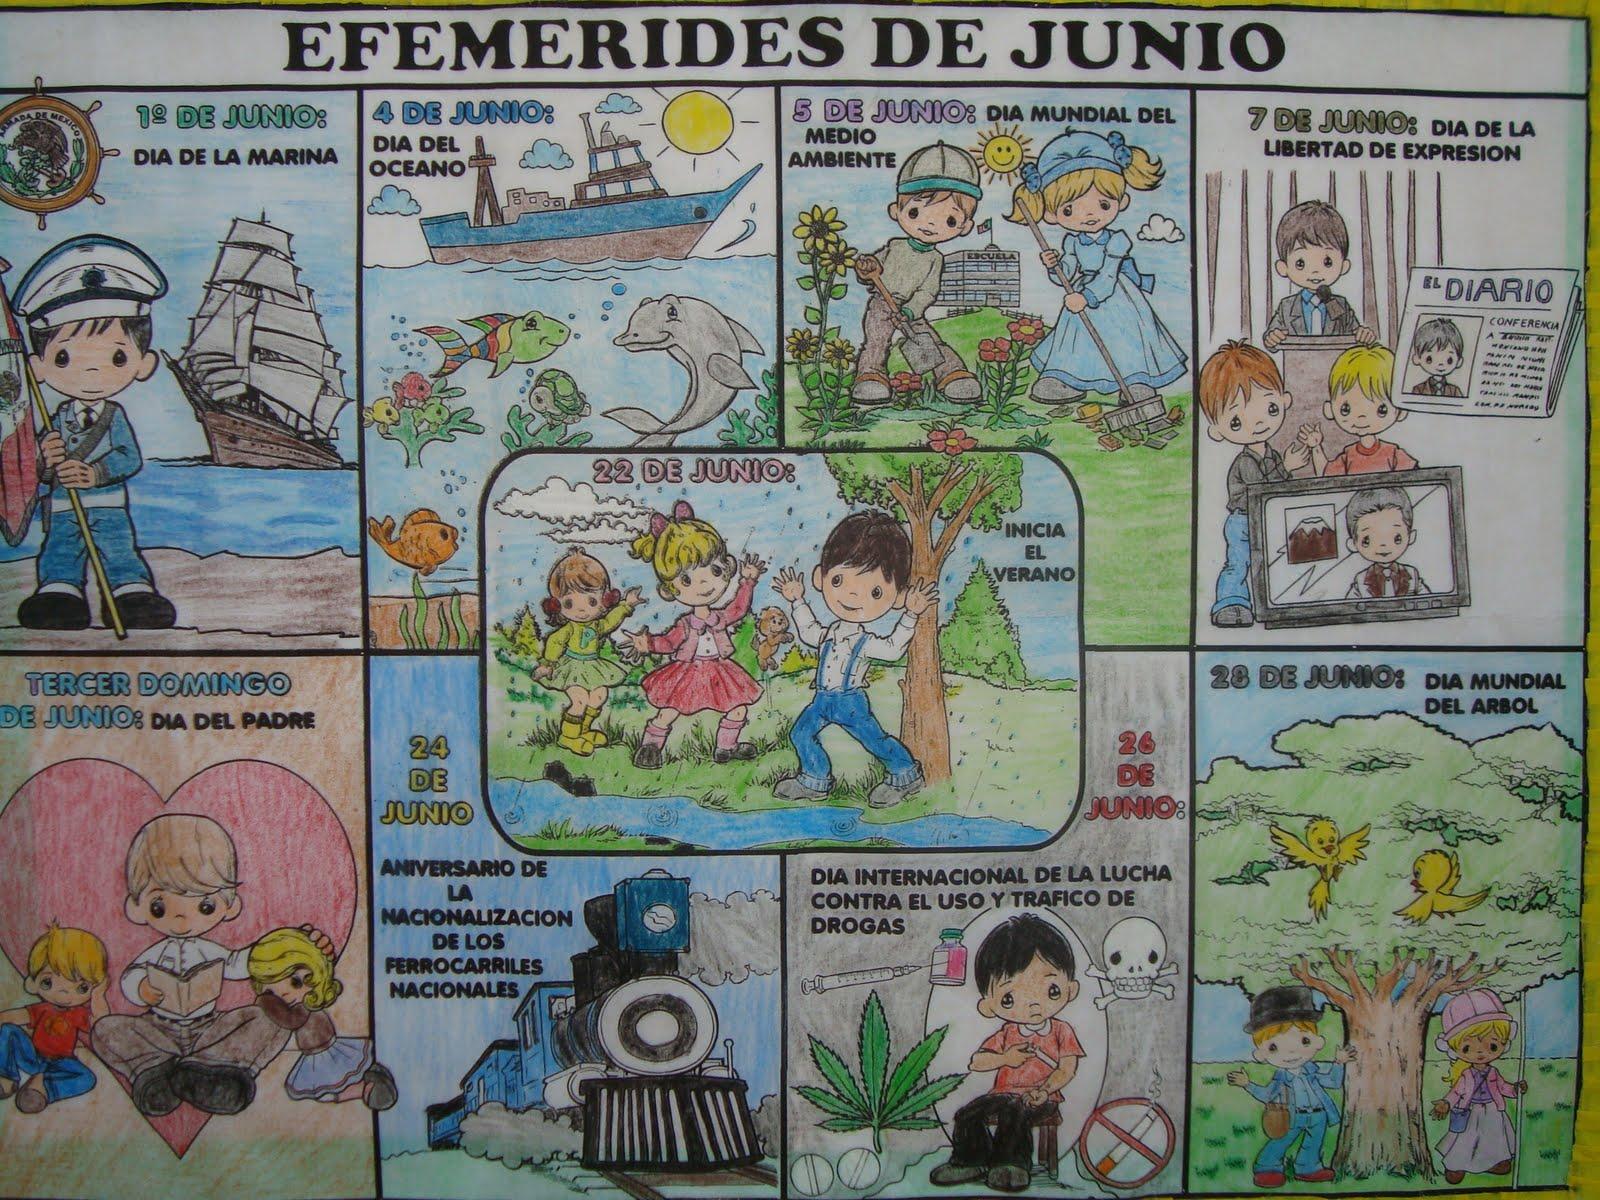 Periodico mural de junio escuela primaria profr benito for Deportes para un periodico mural